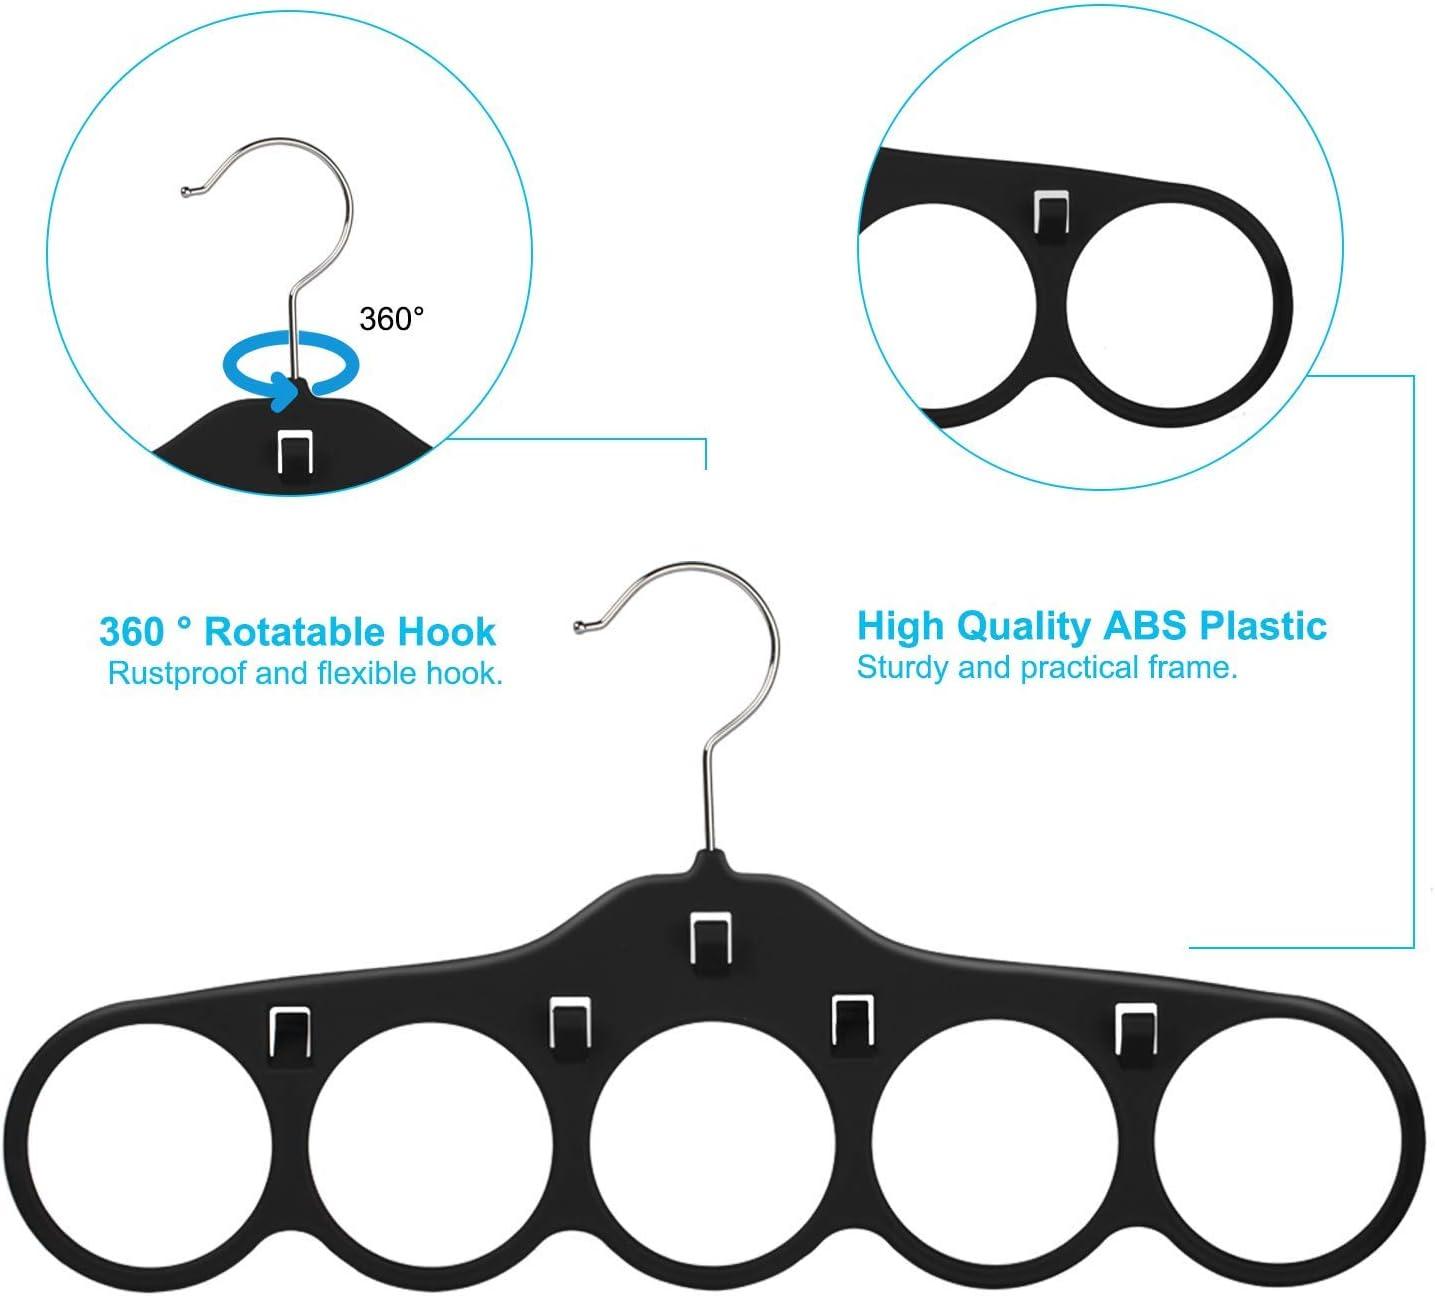 360 Degree Rotating Tie Rack with Hooks SMARTAKE Belt Hanger Bundle with SMARTAKE Scarf Hanger Bow Tie Scarves Non-Slip Durable Hanging Closet Organizer Accessories Holder for Leather Belt